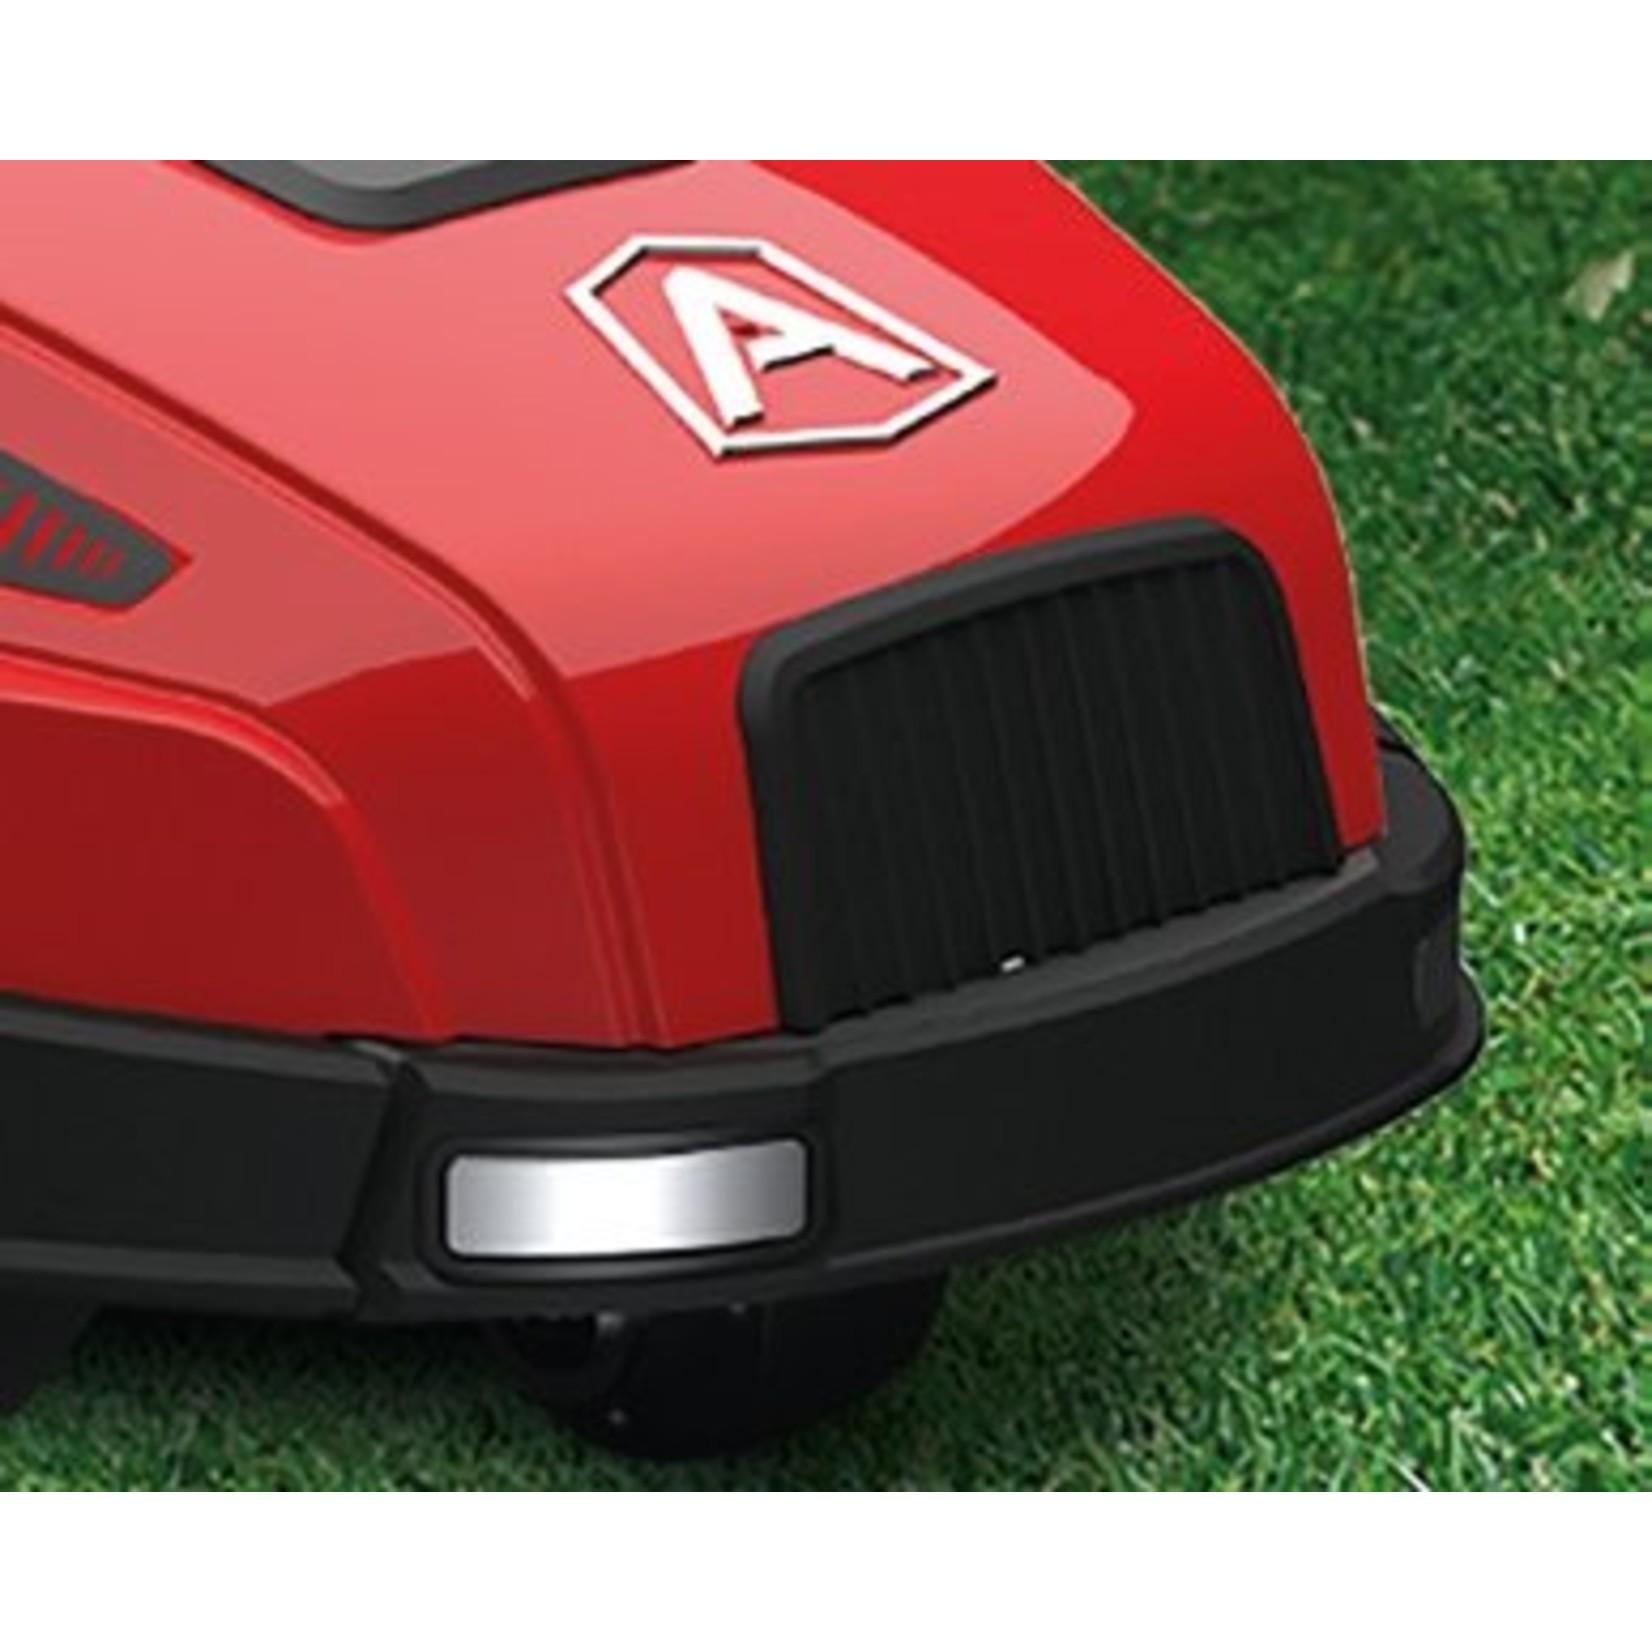 Ambrogio Ambrogio Proline L35 Deluxe Rasenmähroboter Modell 2021